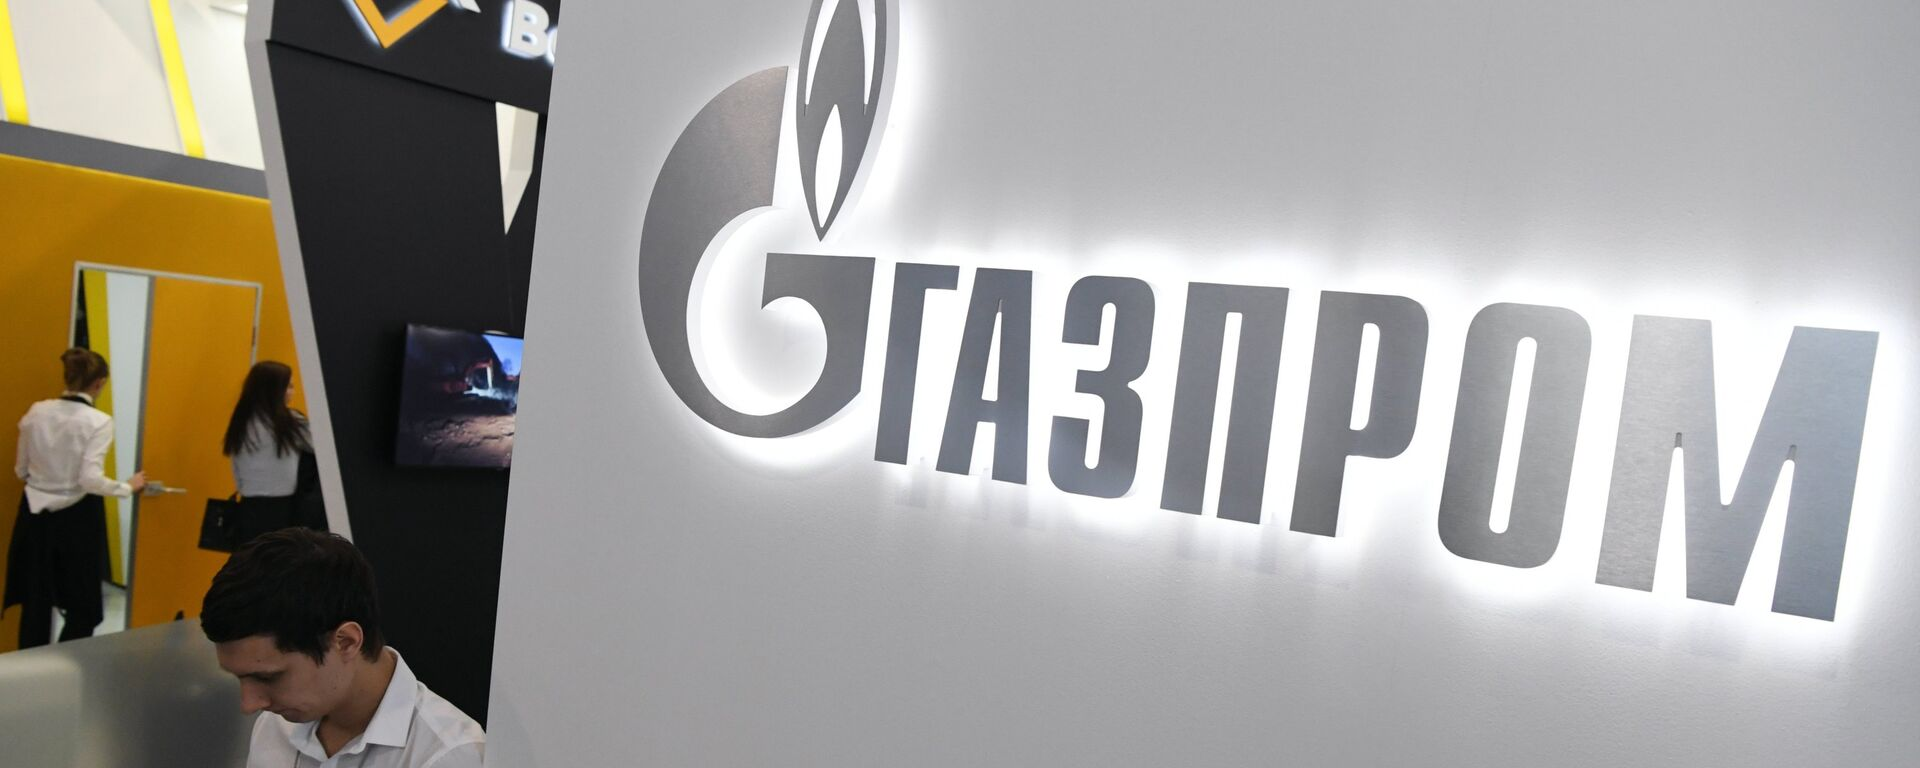 Logo de Gazprom - Sputnik Mundo, 1920, 12.05.2021